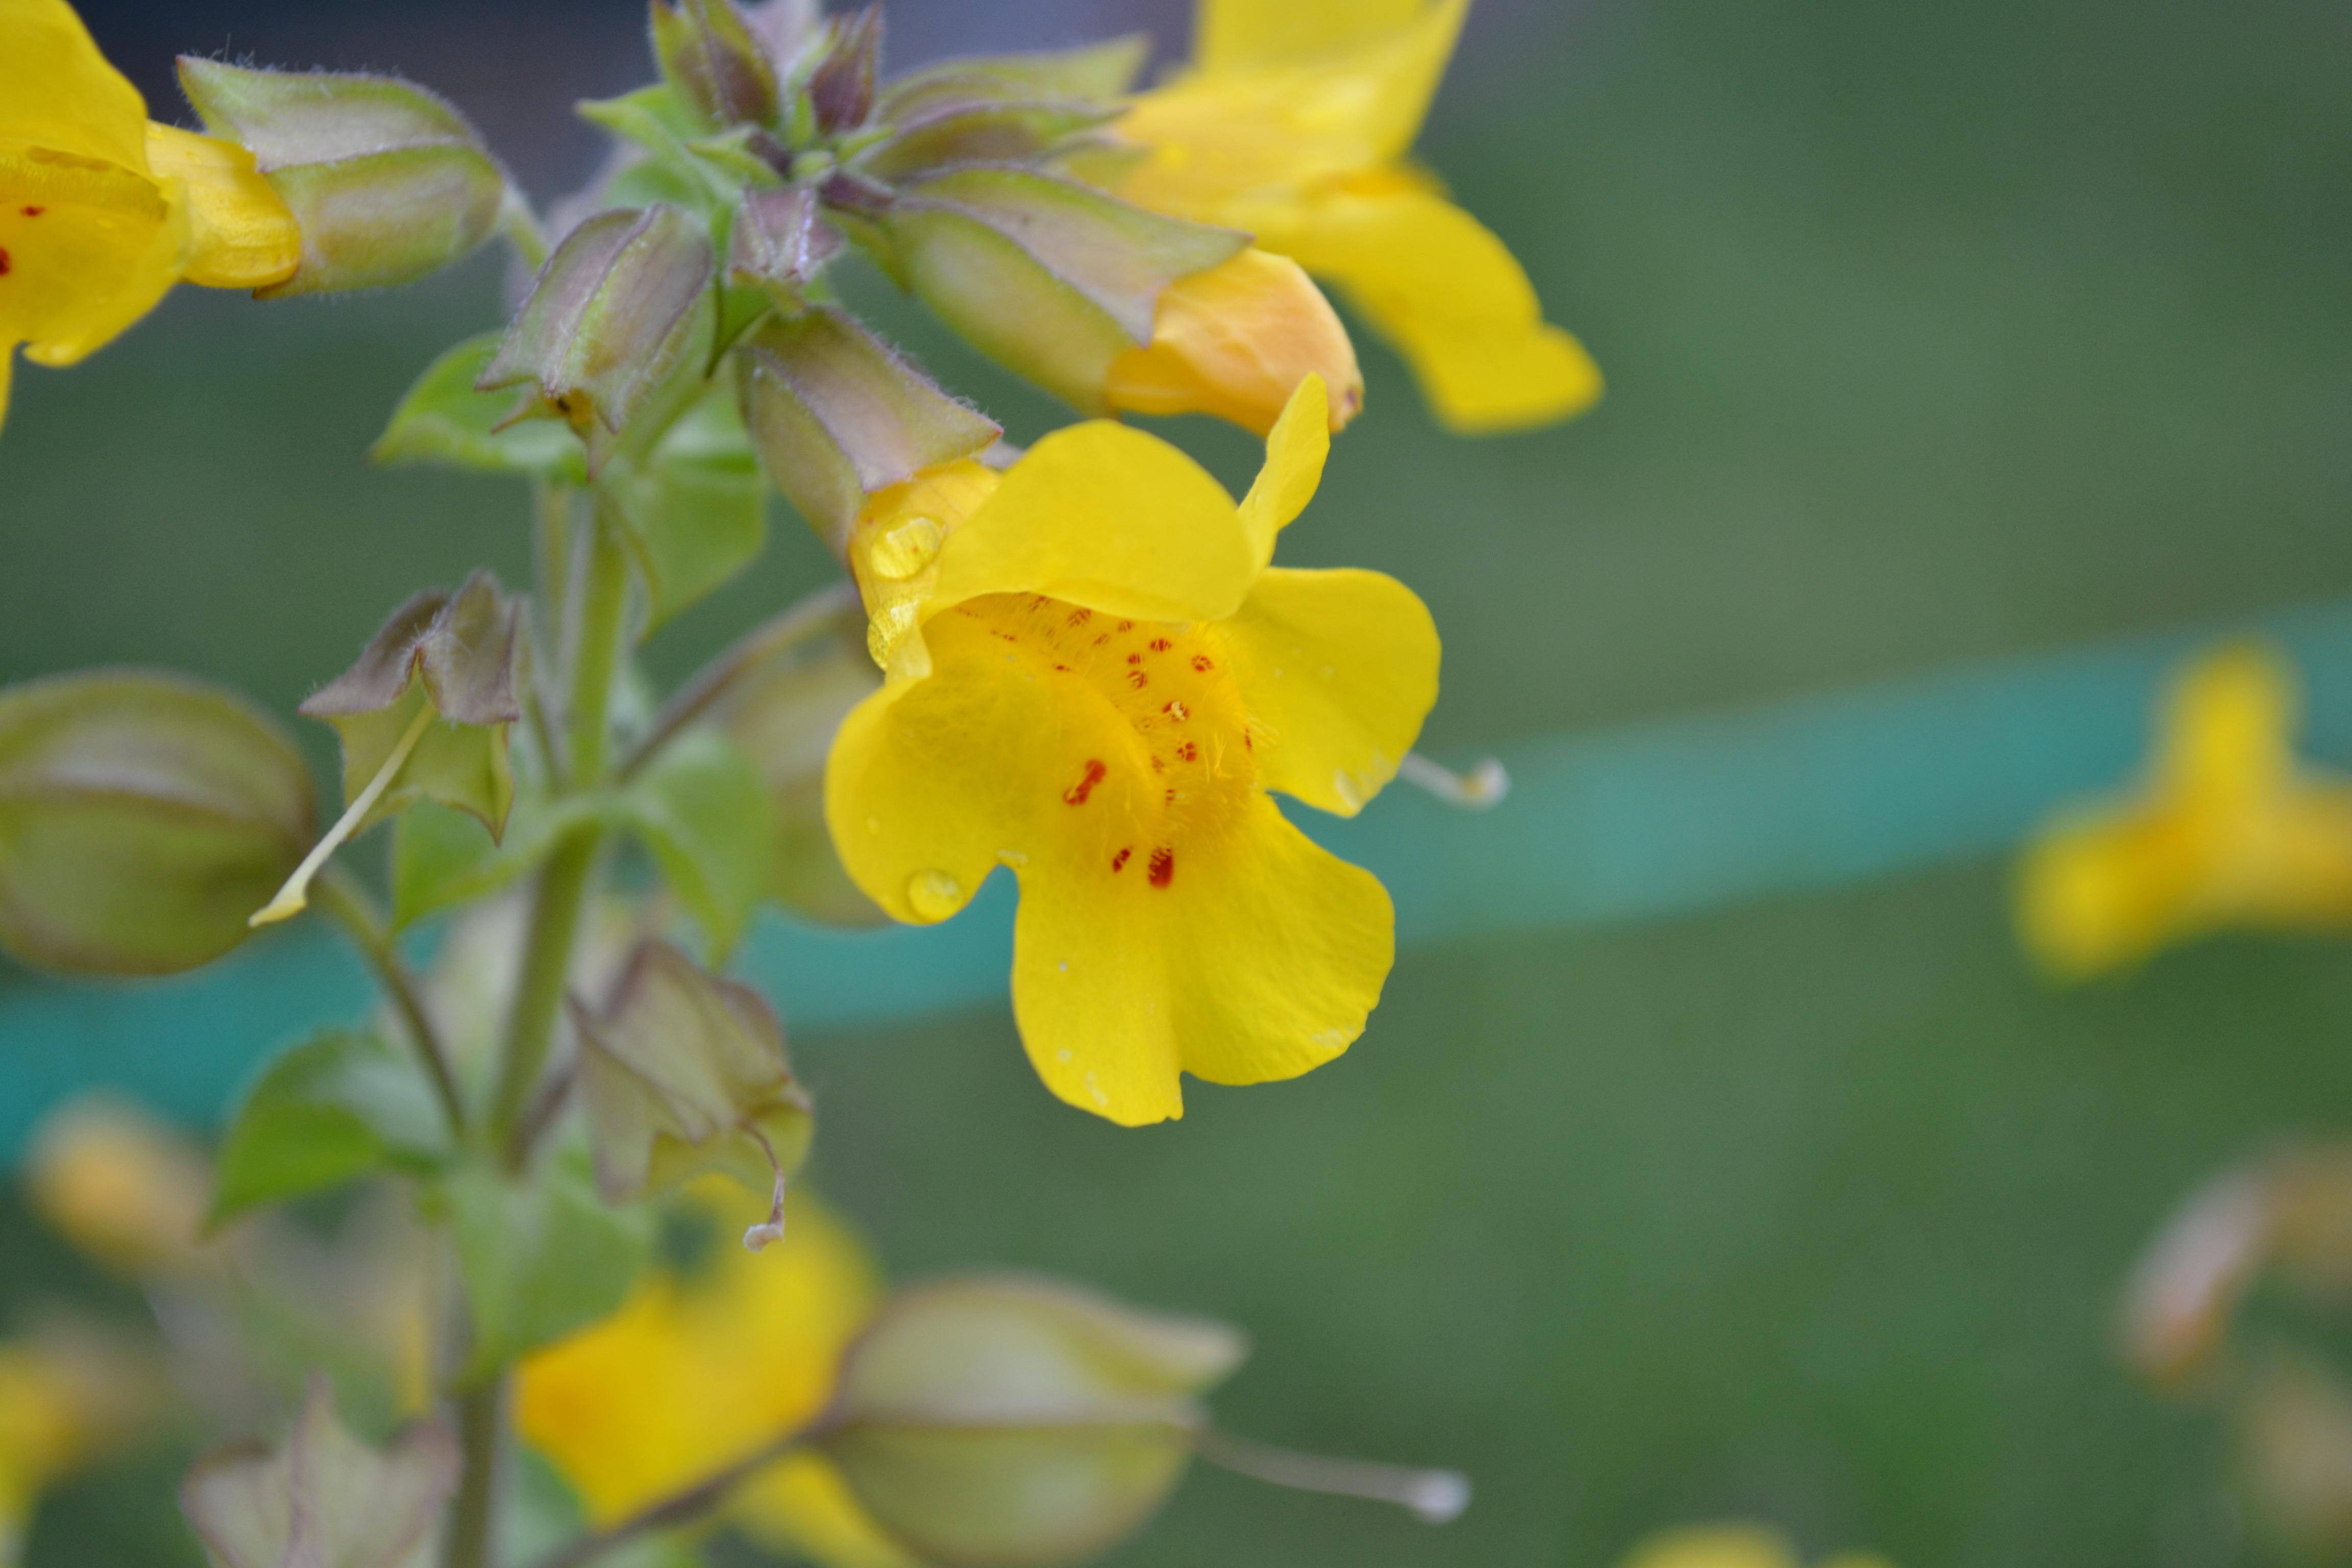 Free Images Nature Blossom Petal Green Produce Botany Yellow